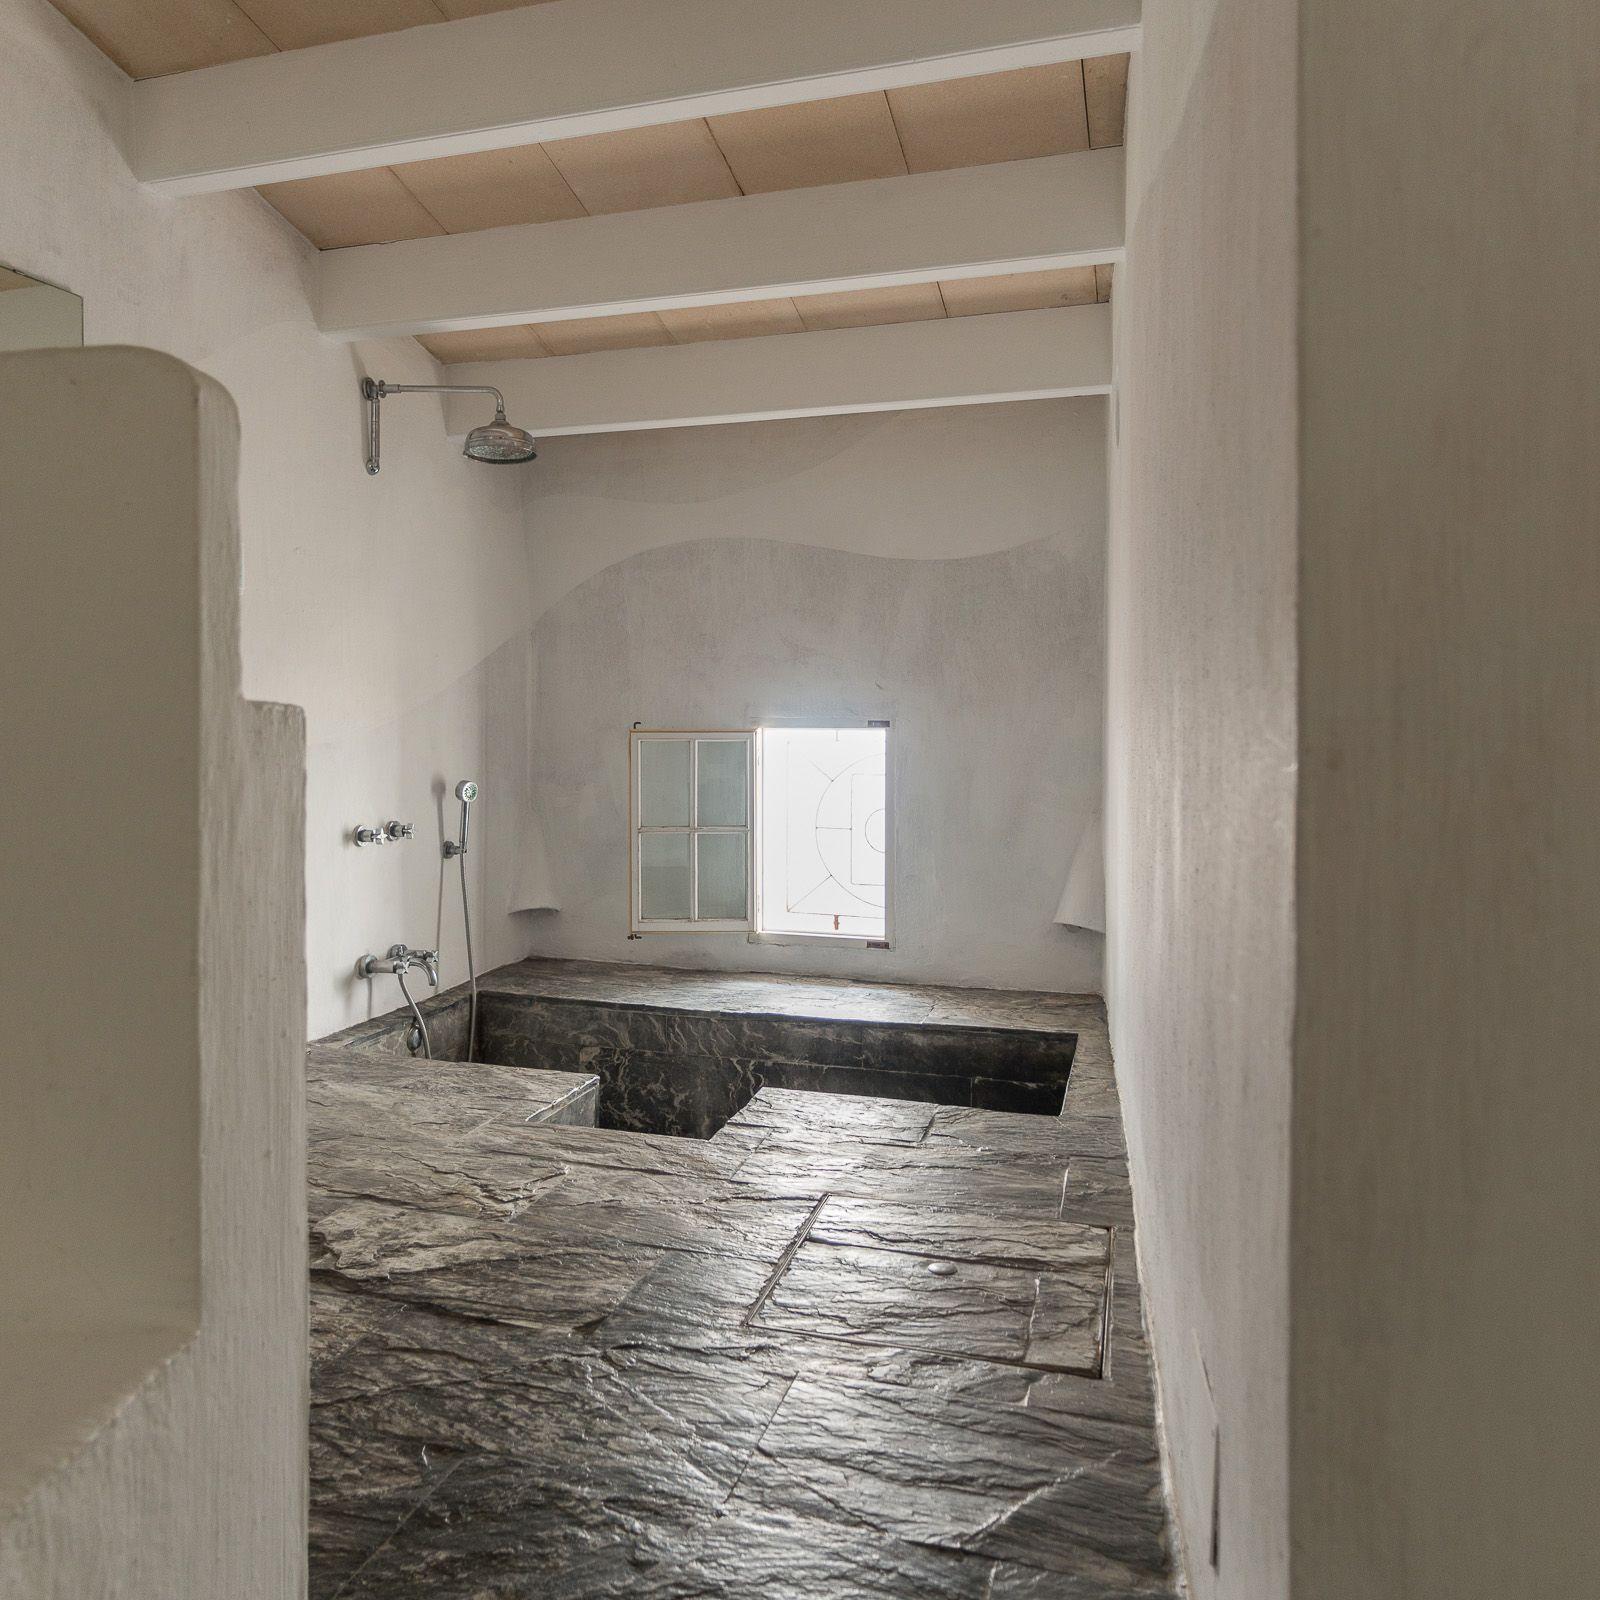 Sant Josep - Hotel Tres Sants Rooms